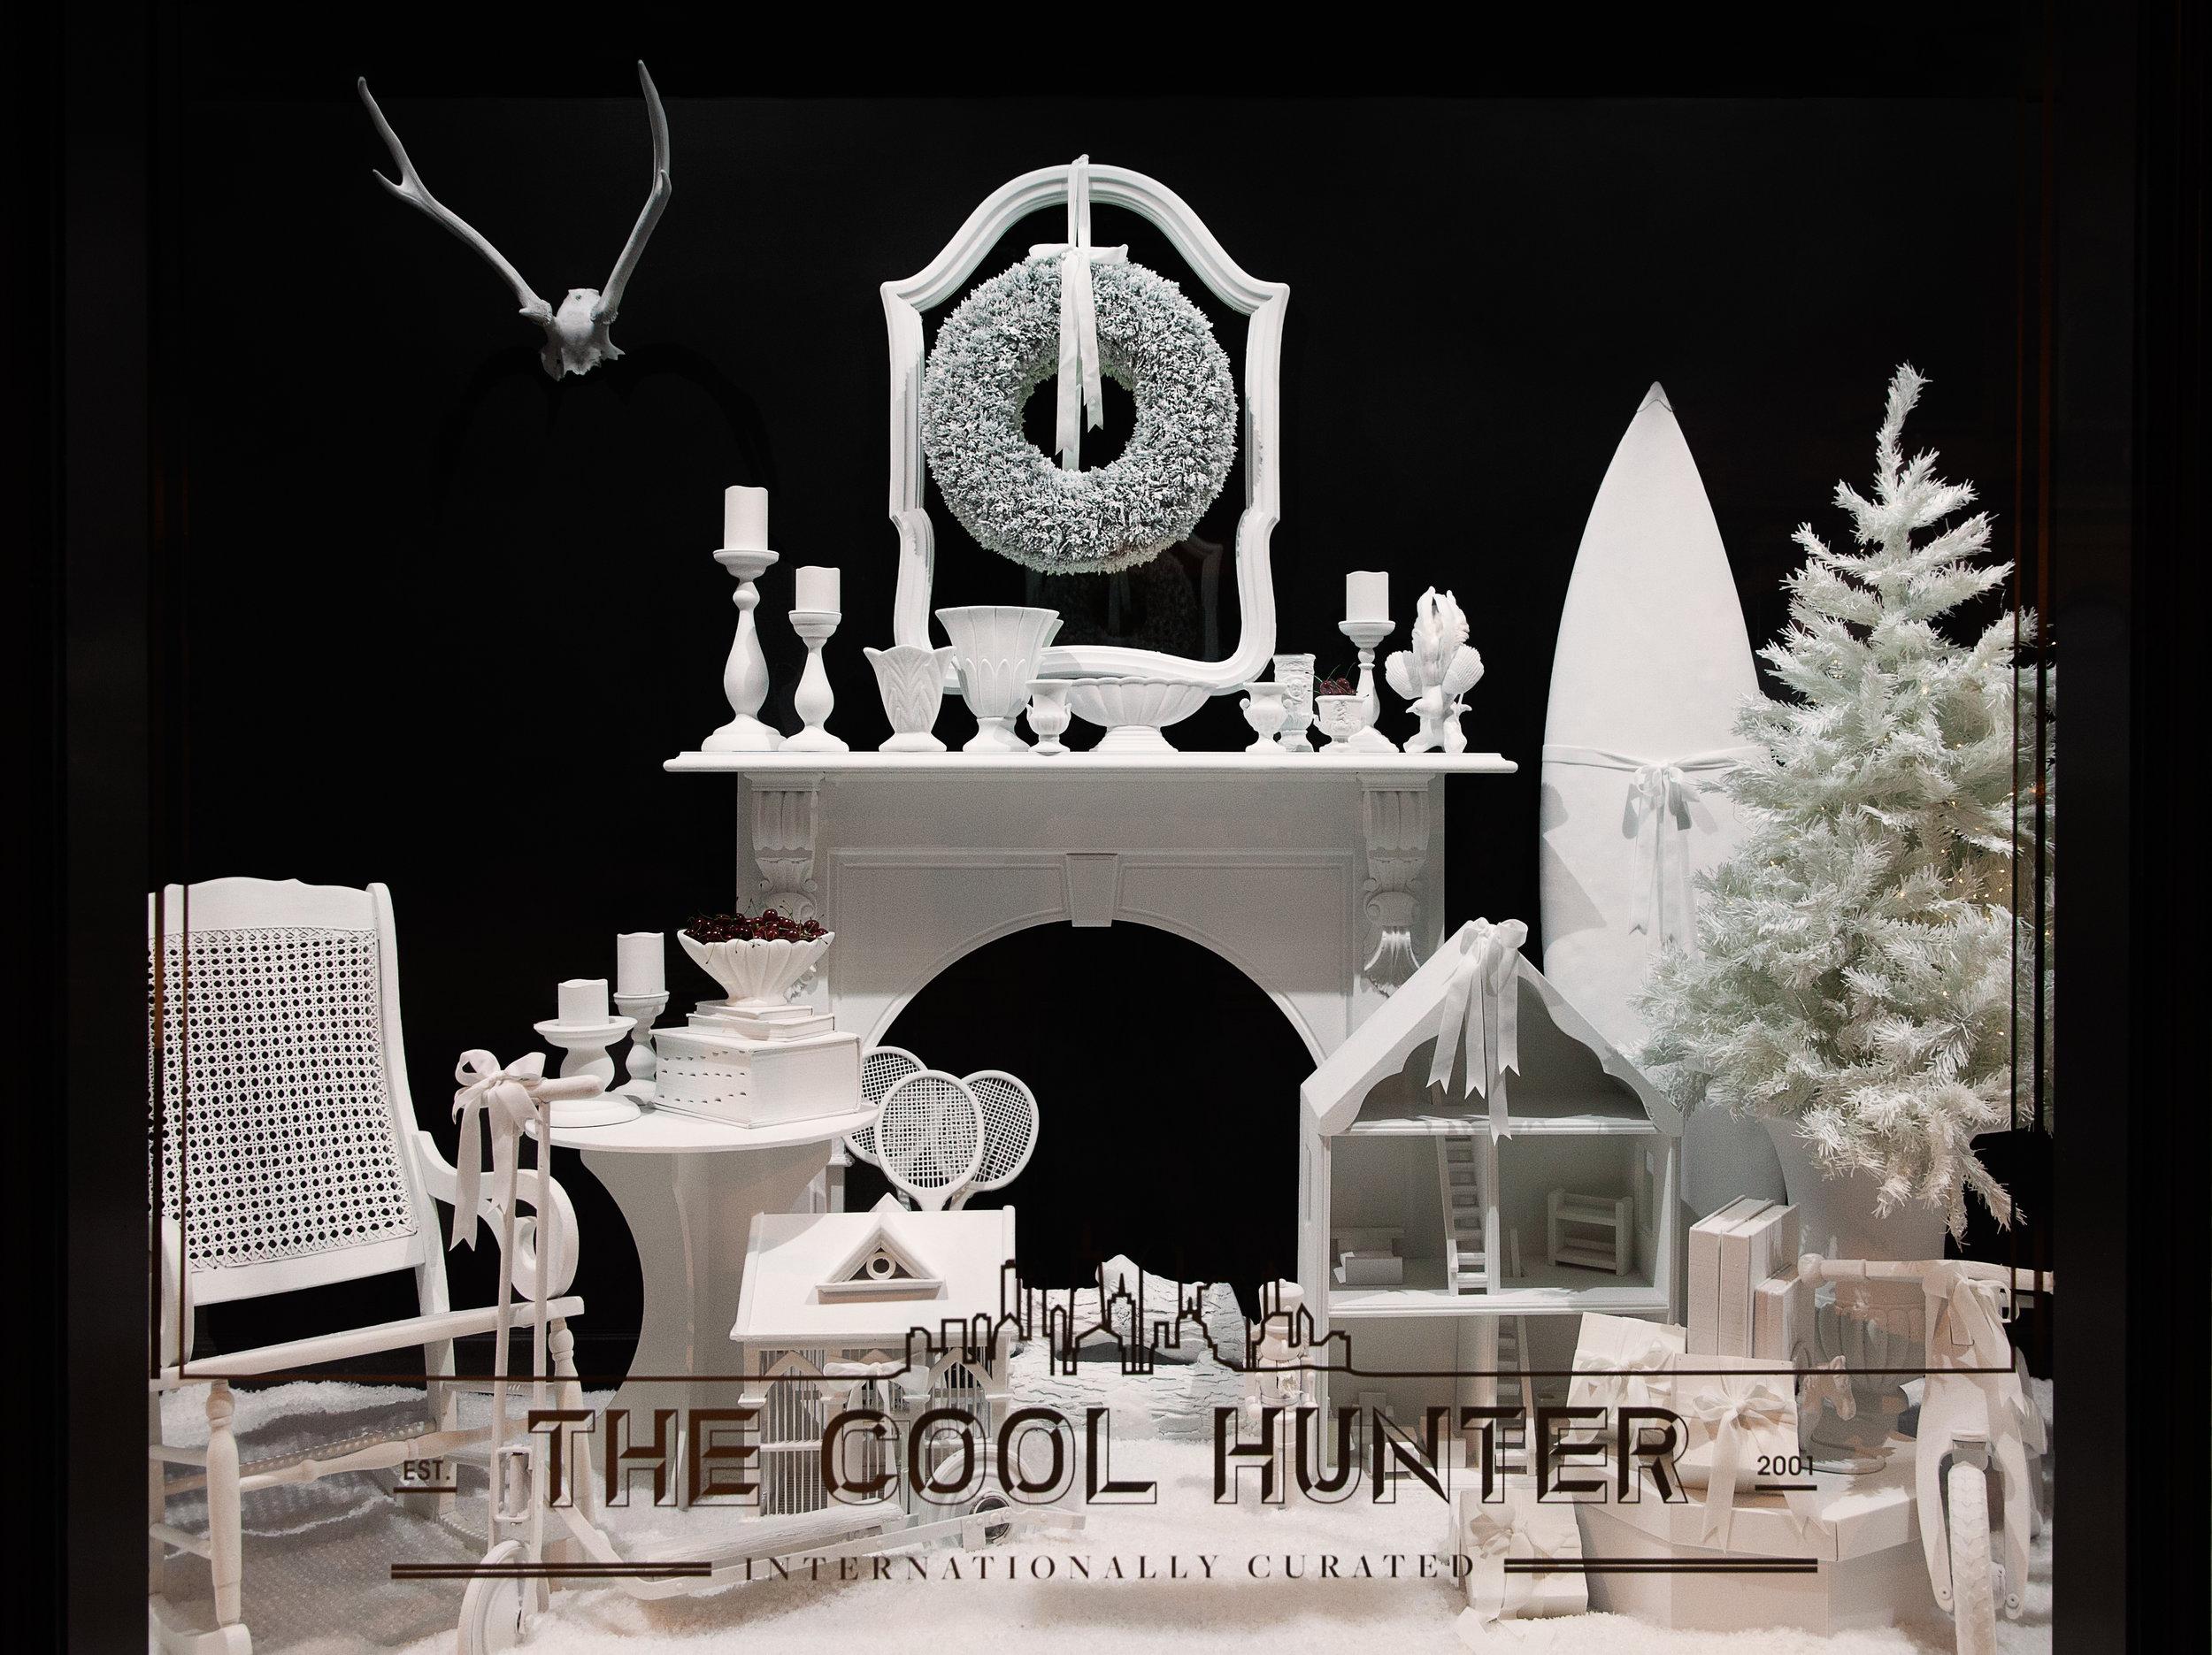 The_Cool_Hunter-7.jpg